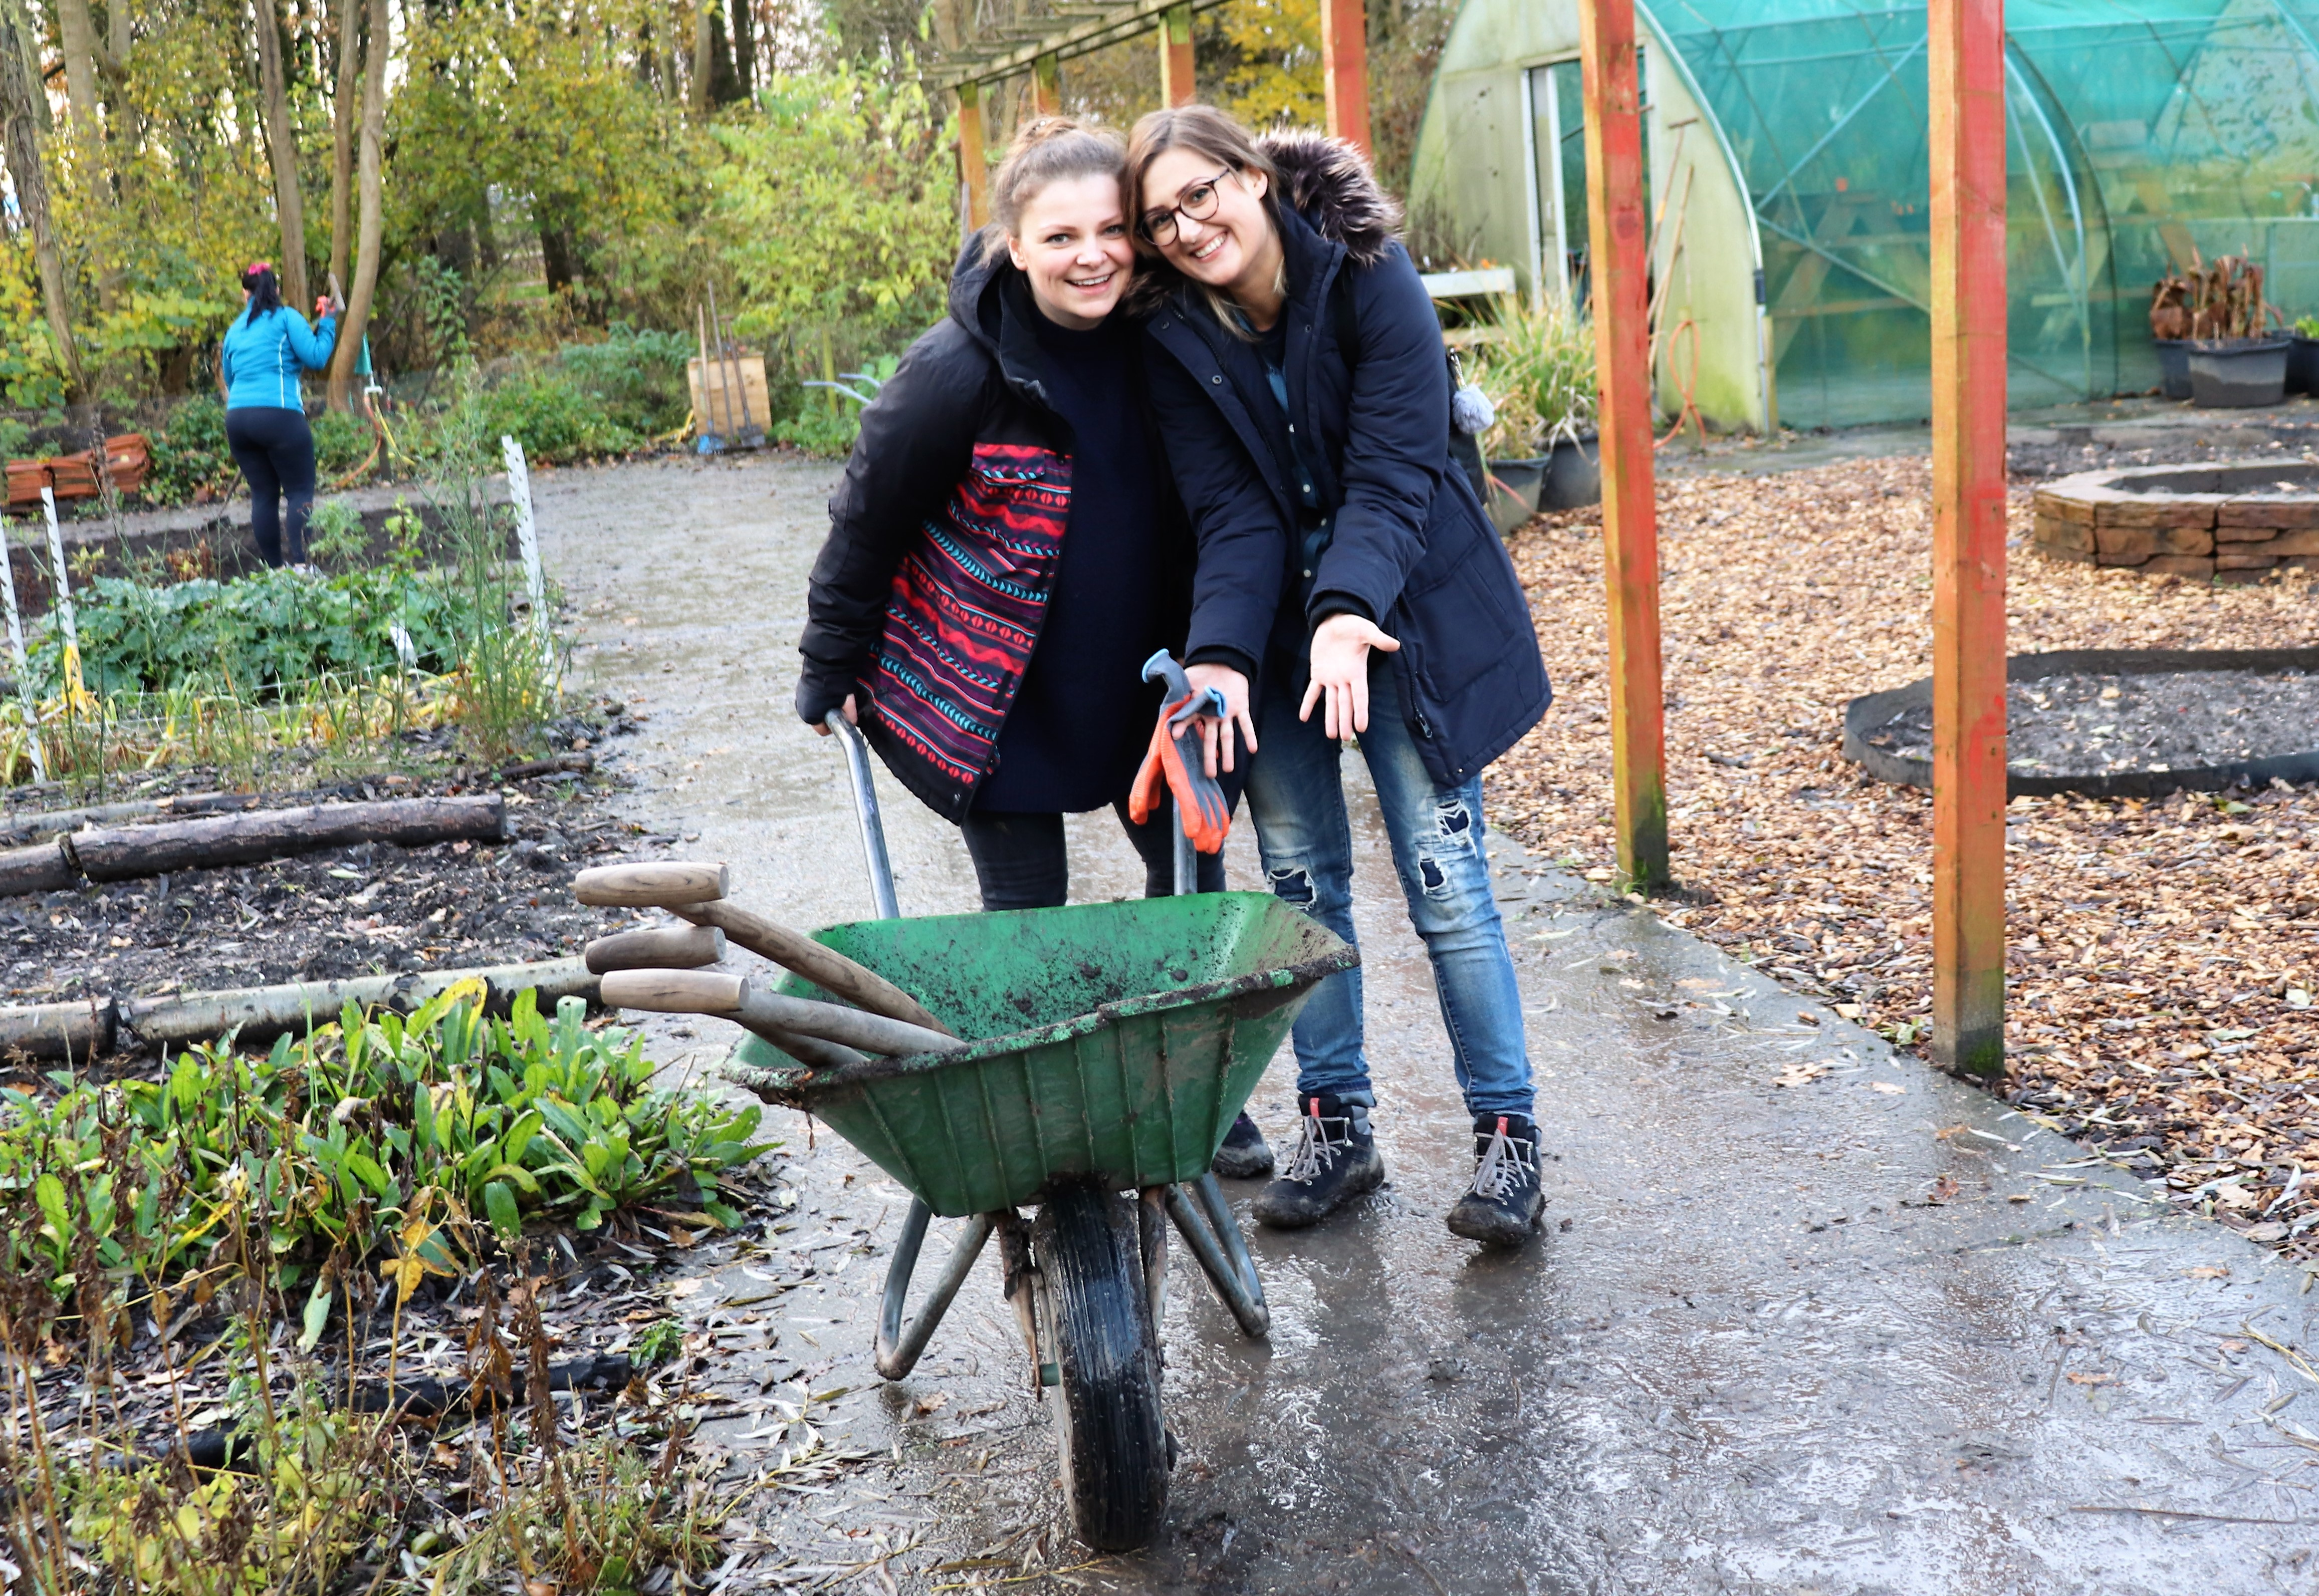 Kasia Padding-Slodziak (right) during her Day of Caring